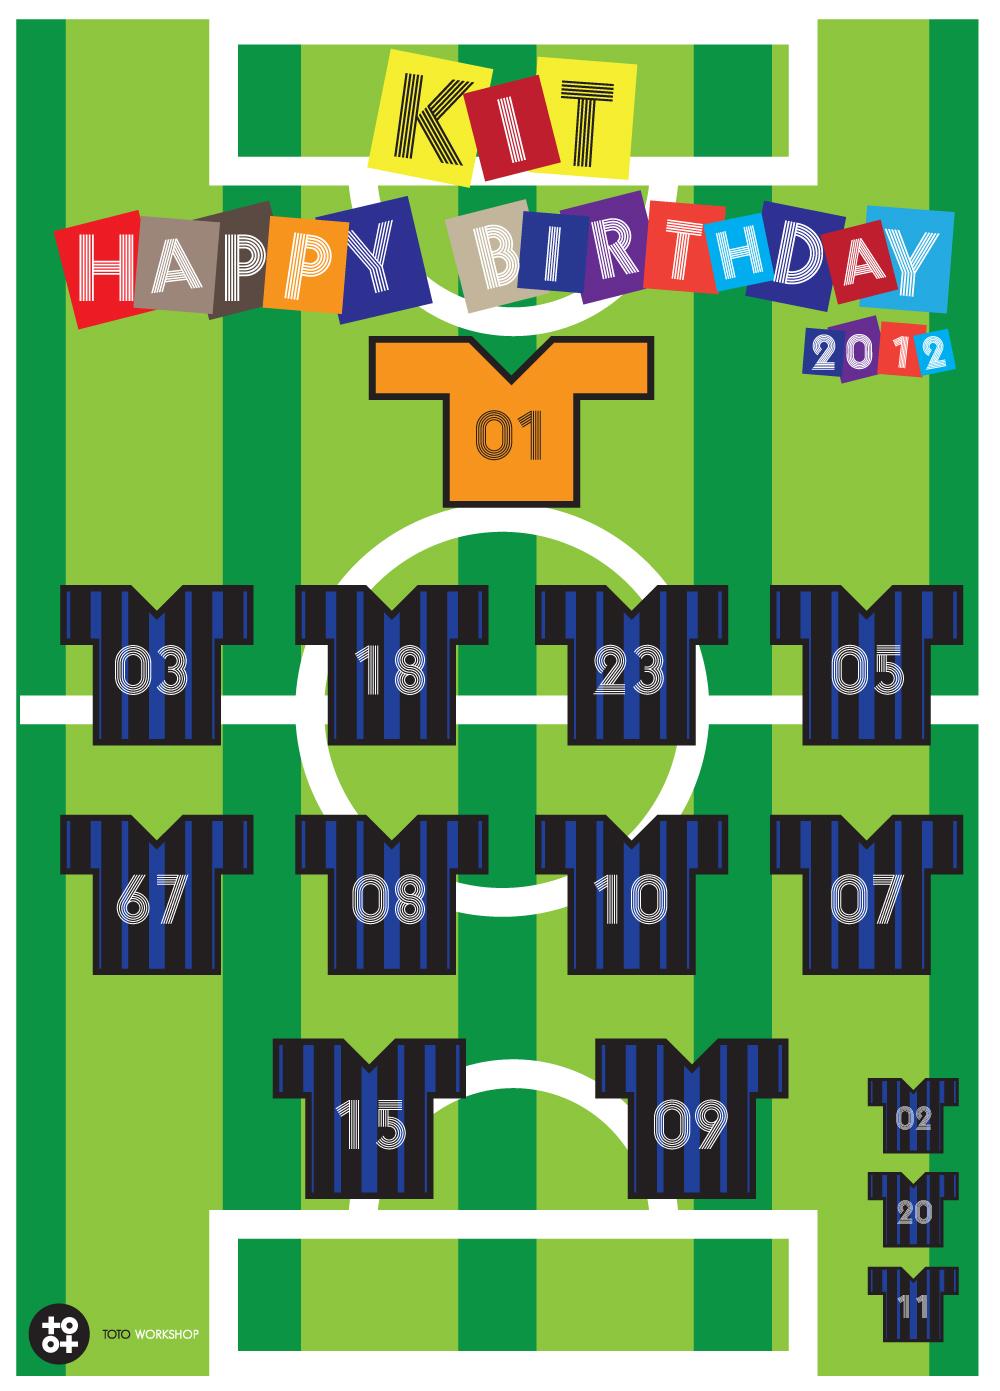 toto workshop birthday card design for my best friend  soccer match, Birthday card